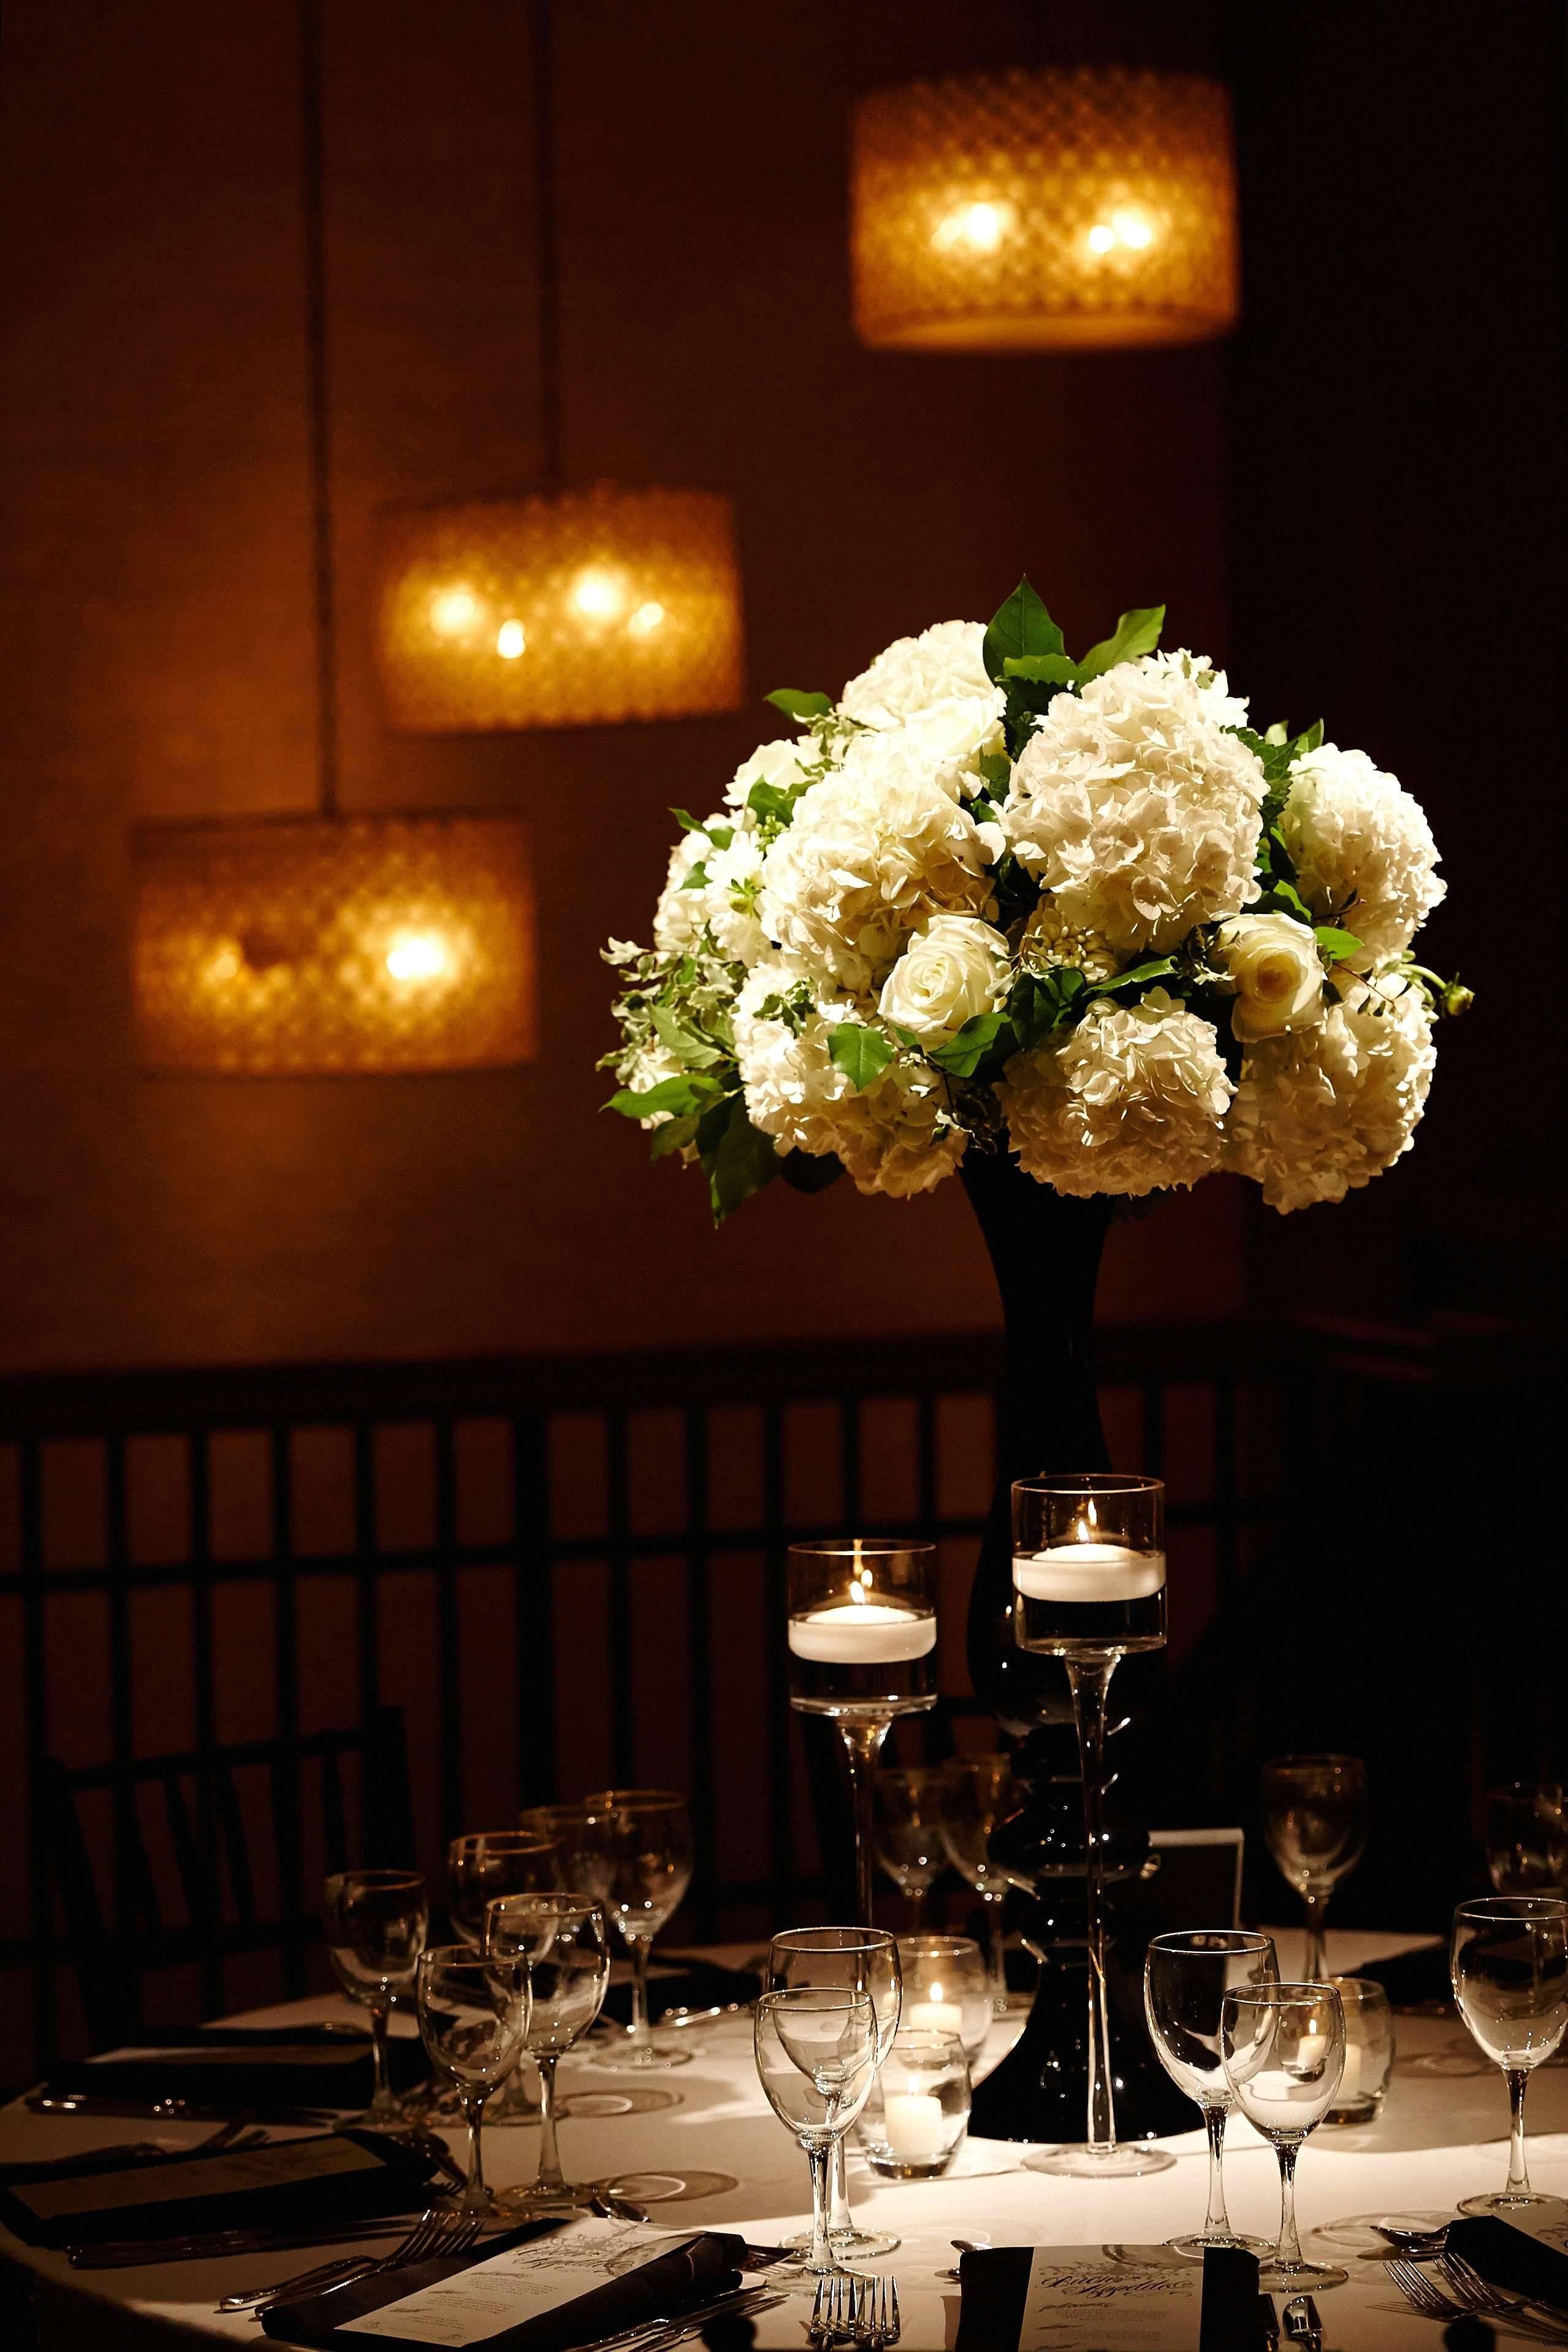 aluminum flower vase of bride to be decorations luxury il fullxfull h vases black vase white for bride to be decorations luxury il fullxfull h vases black vase white flowers zoomi 0d with